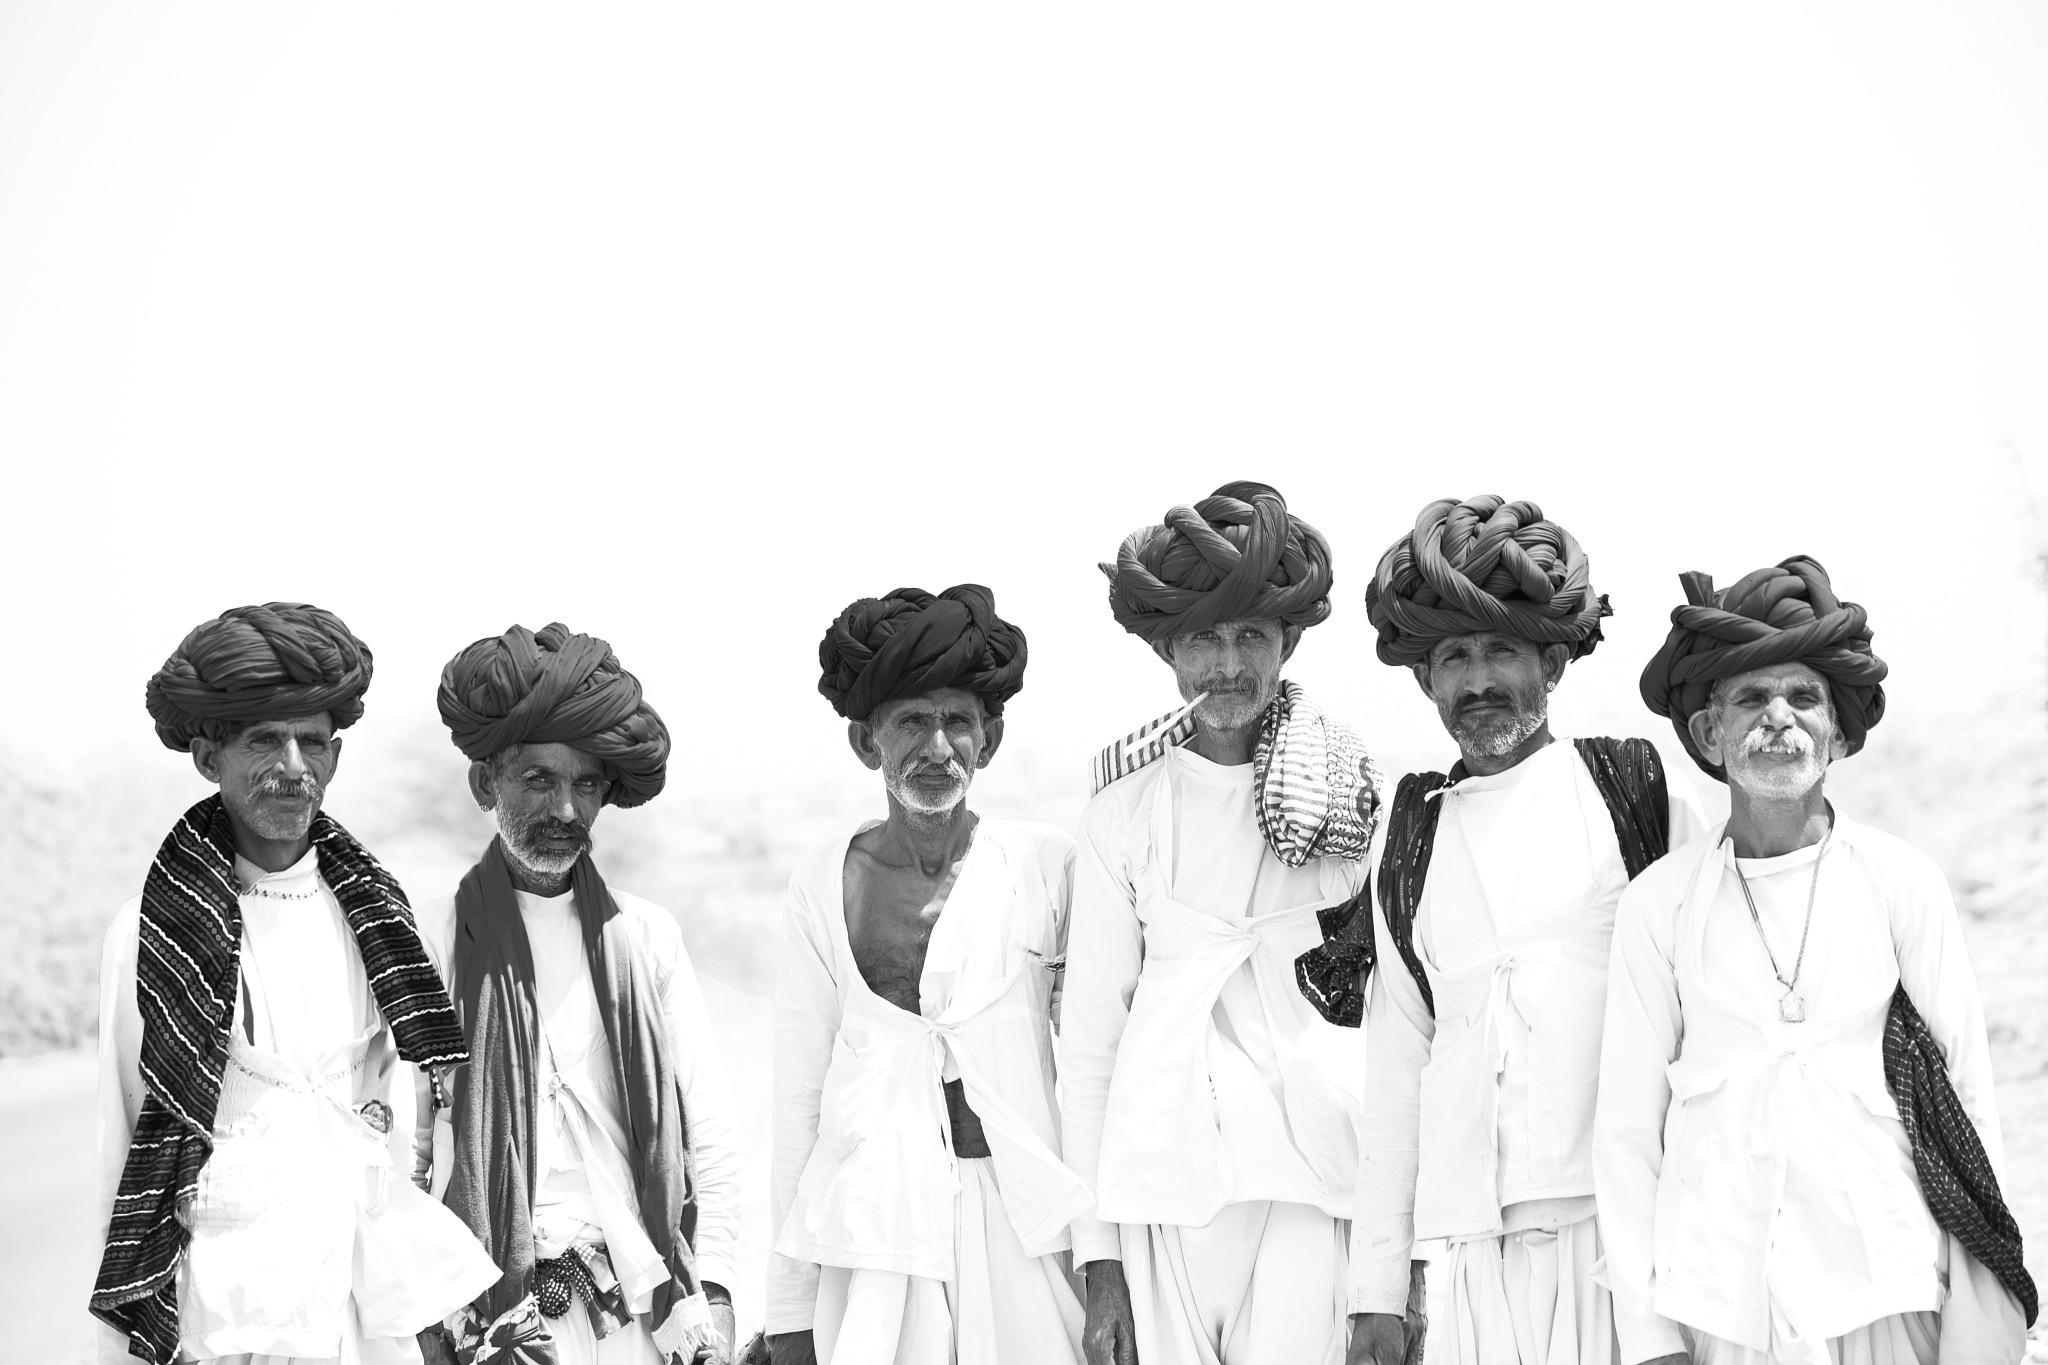 Turbans of Rajasthan by Harsh Patel